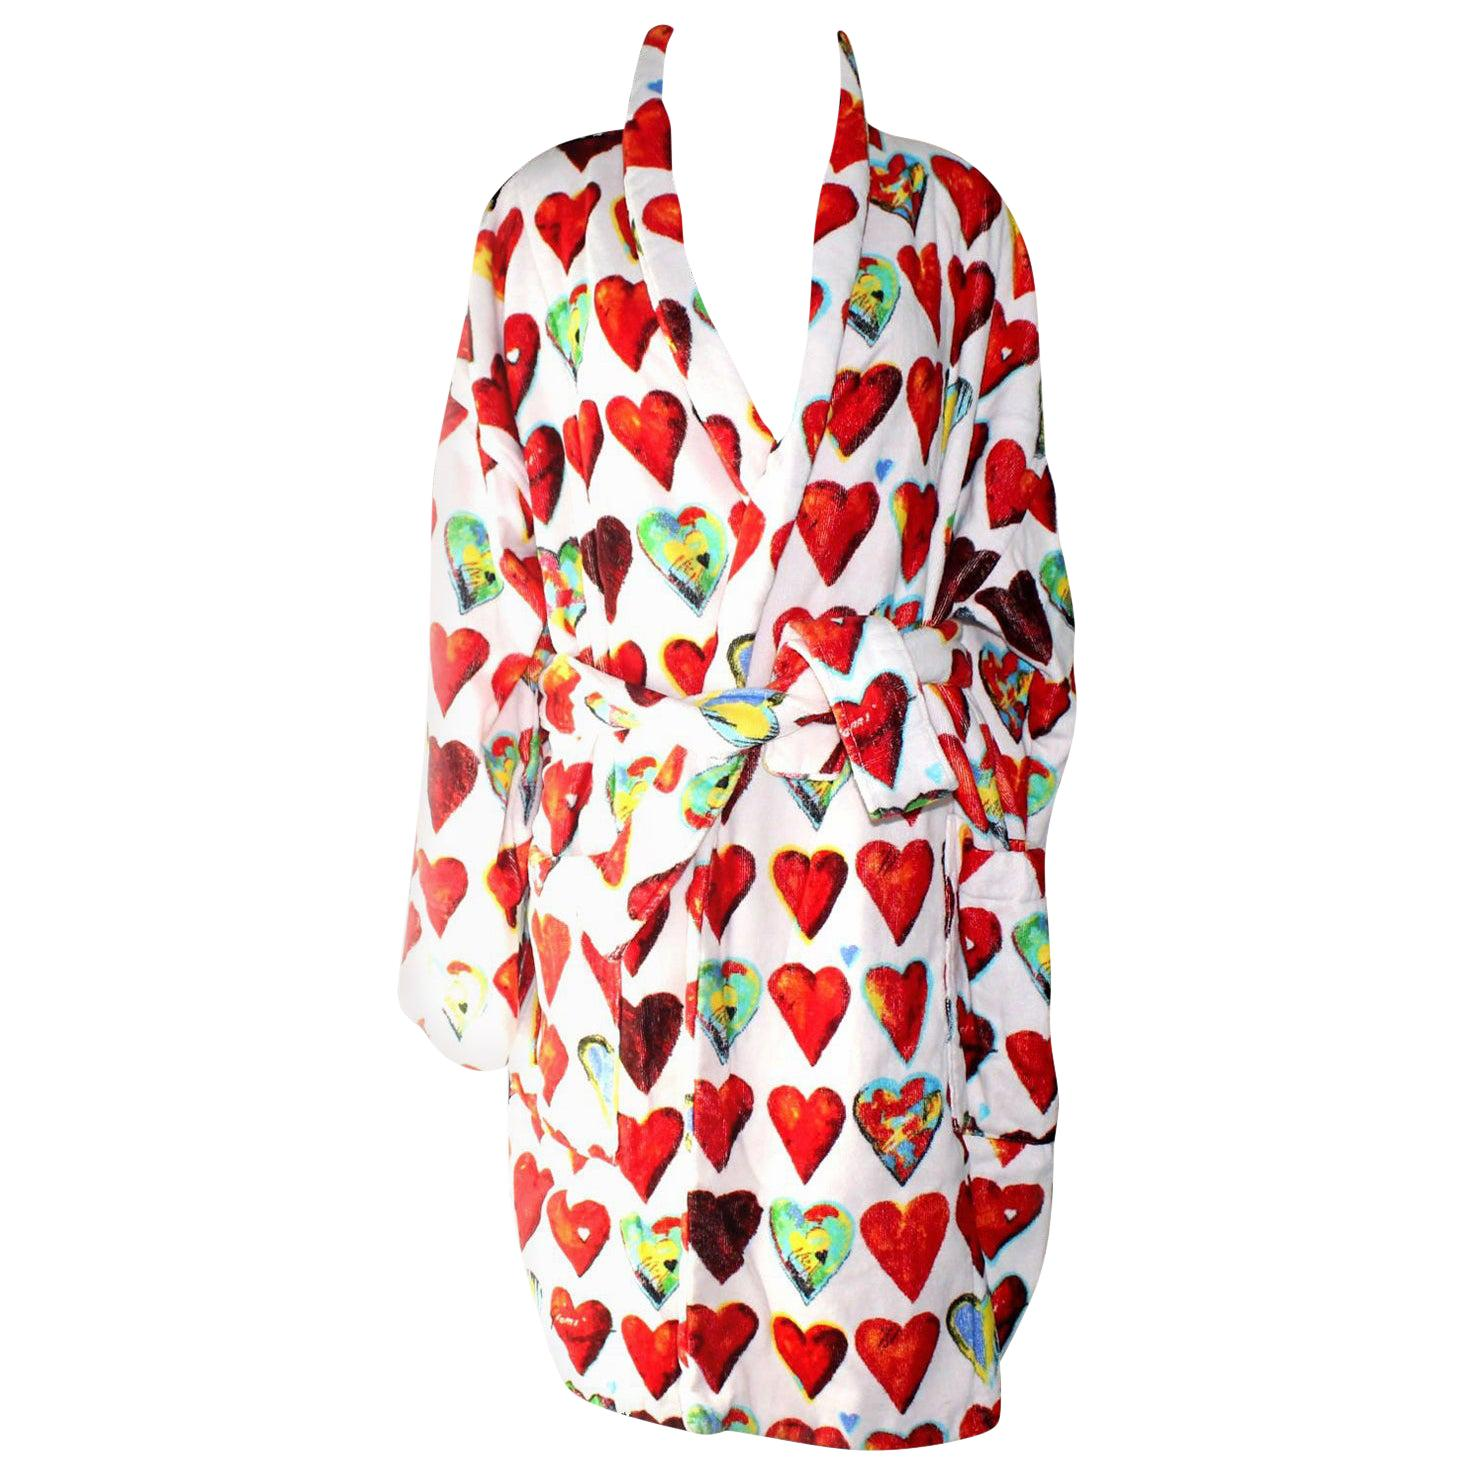 Unique Gianni Versace Hearts Print Terrycloth Terry Towel Bathrobe Coat Robe